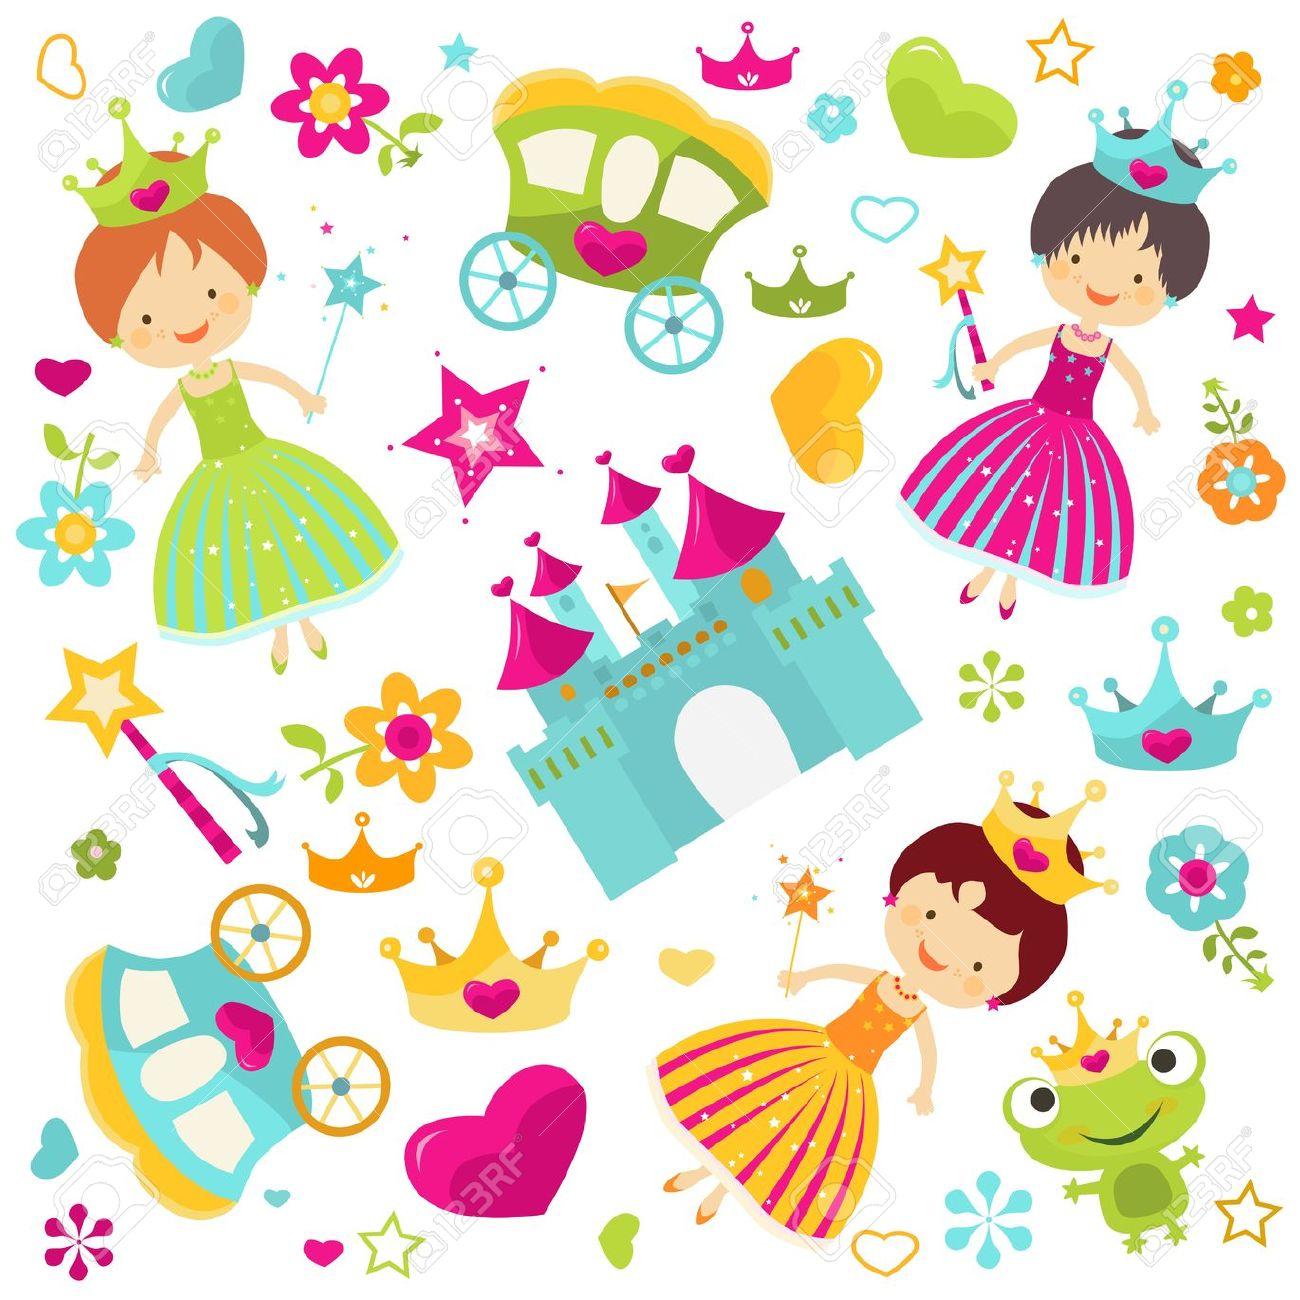 Little Princess Clipart.